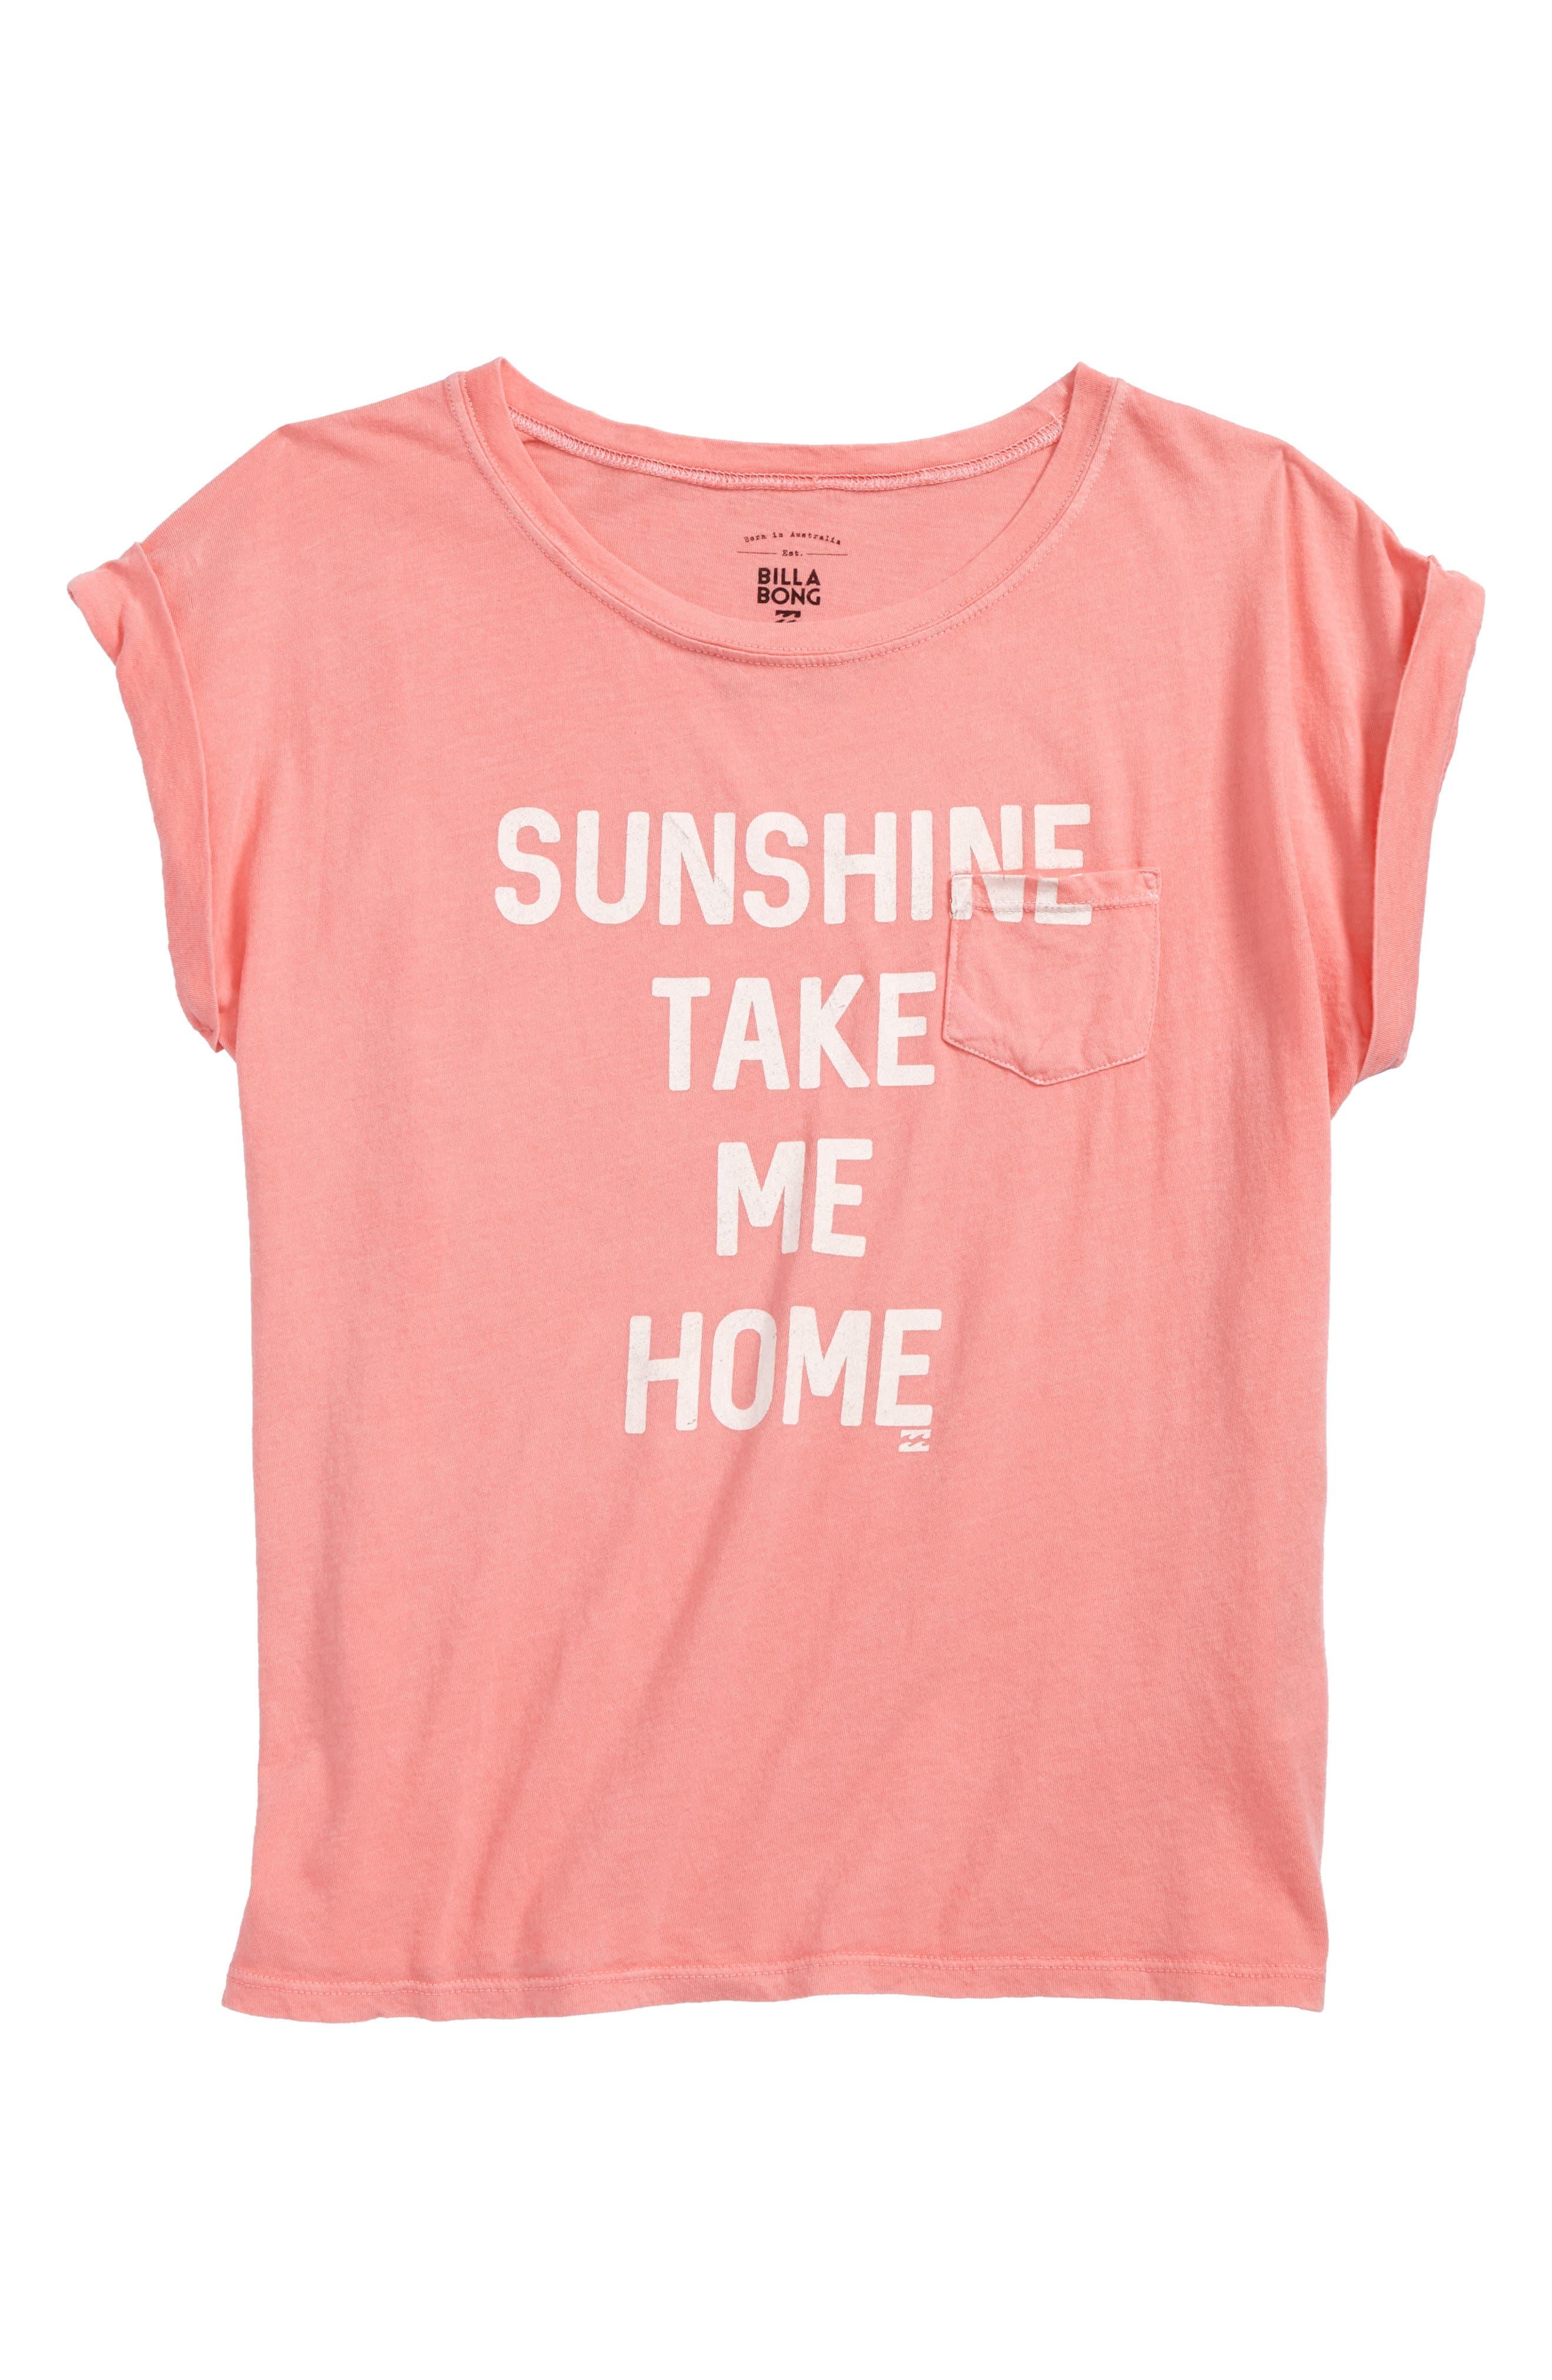 Main Image - Billabong Sunshine Take Me Home Graphic Tee (Little Girls & Big Girls)